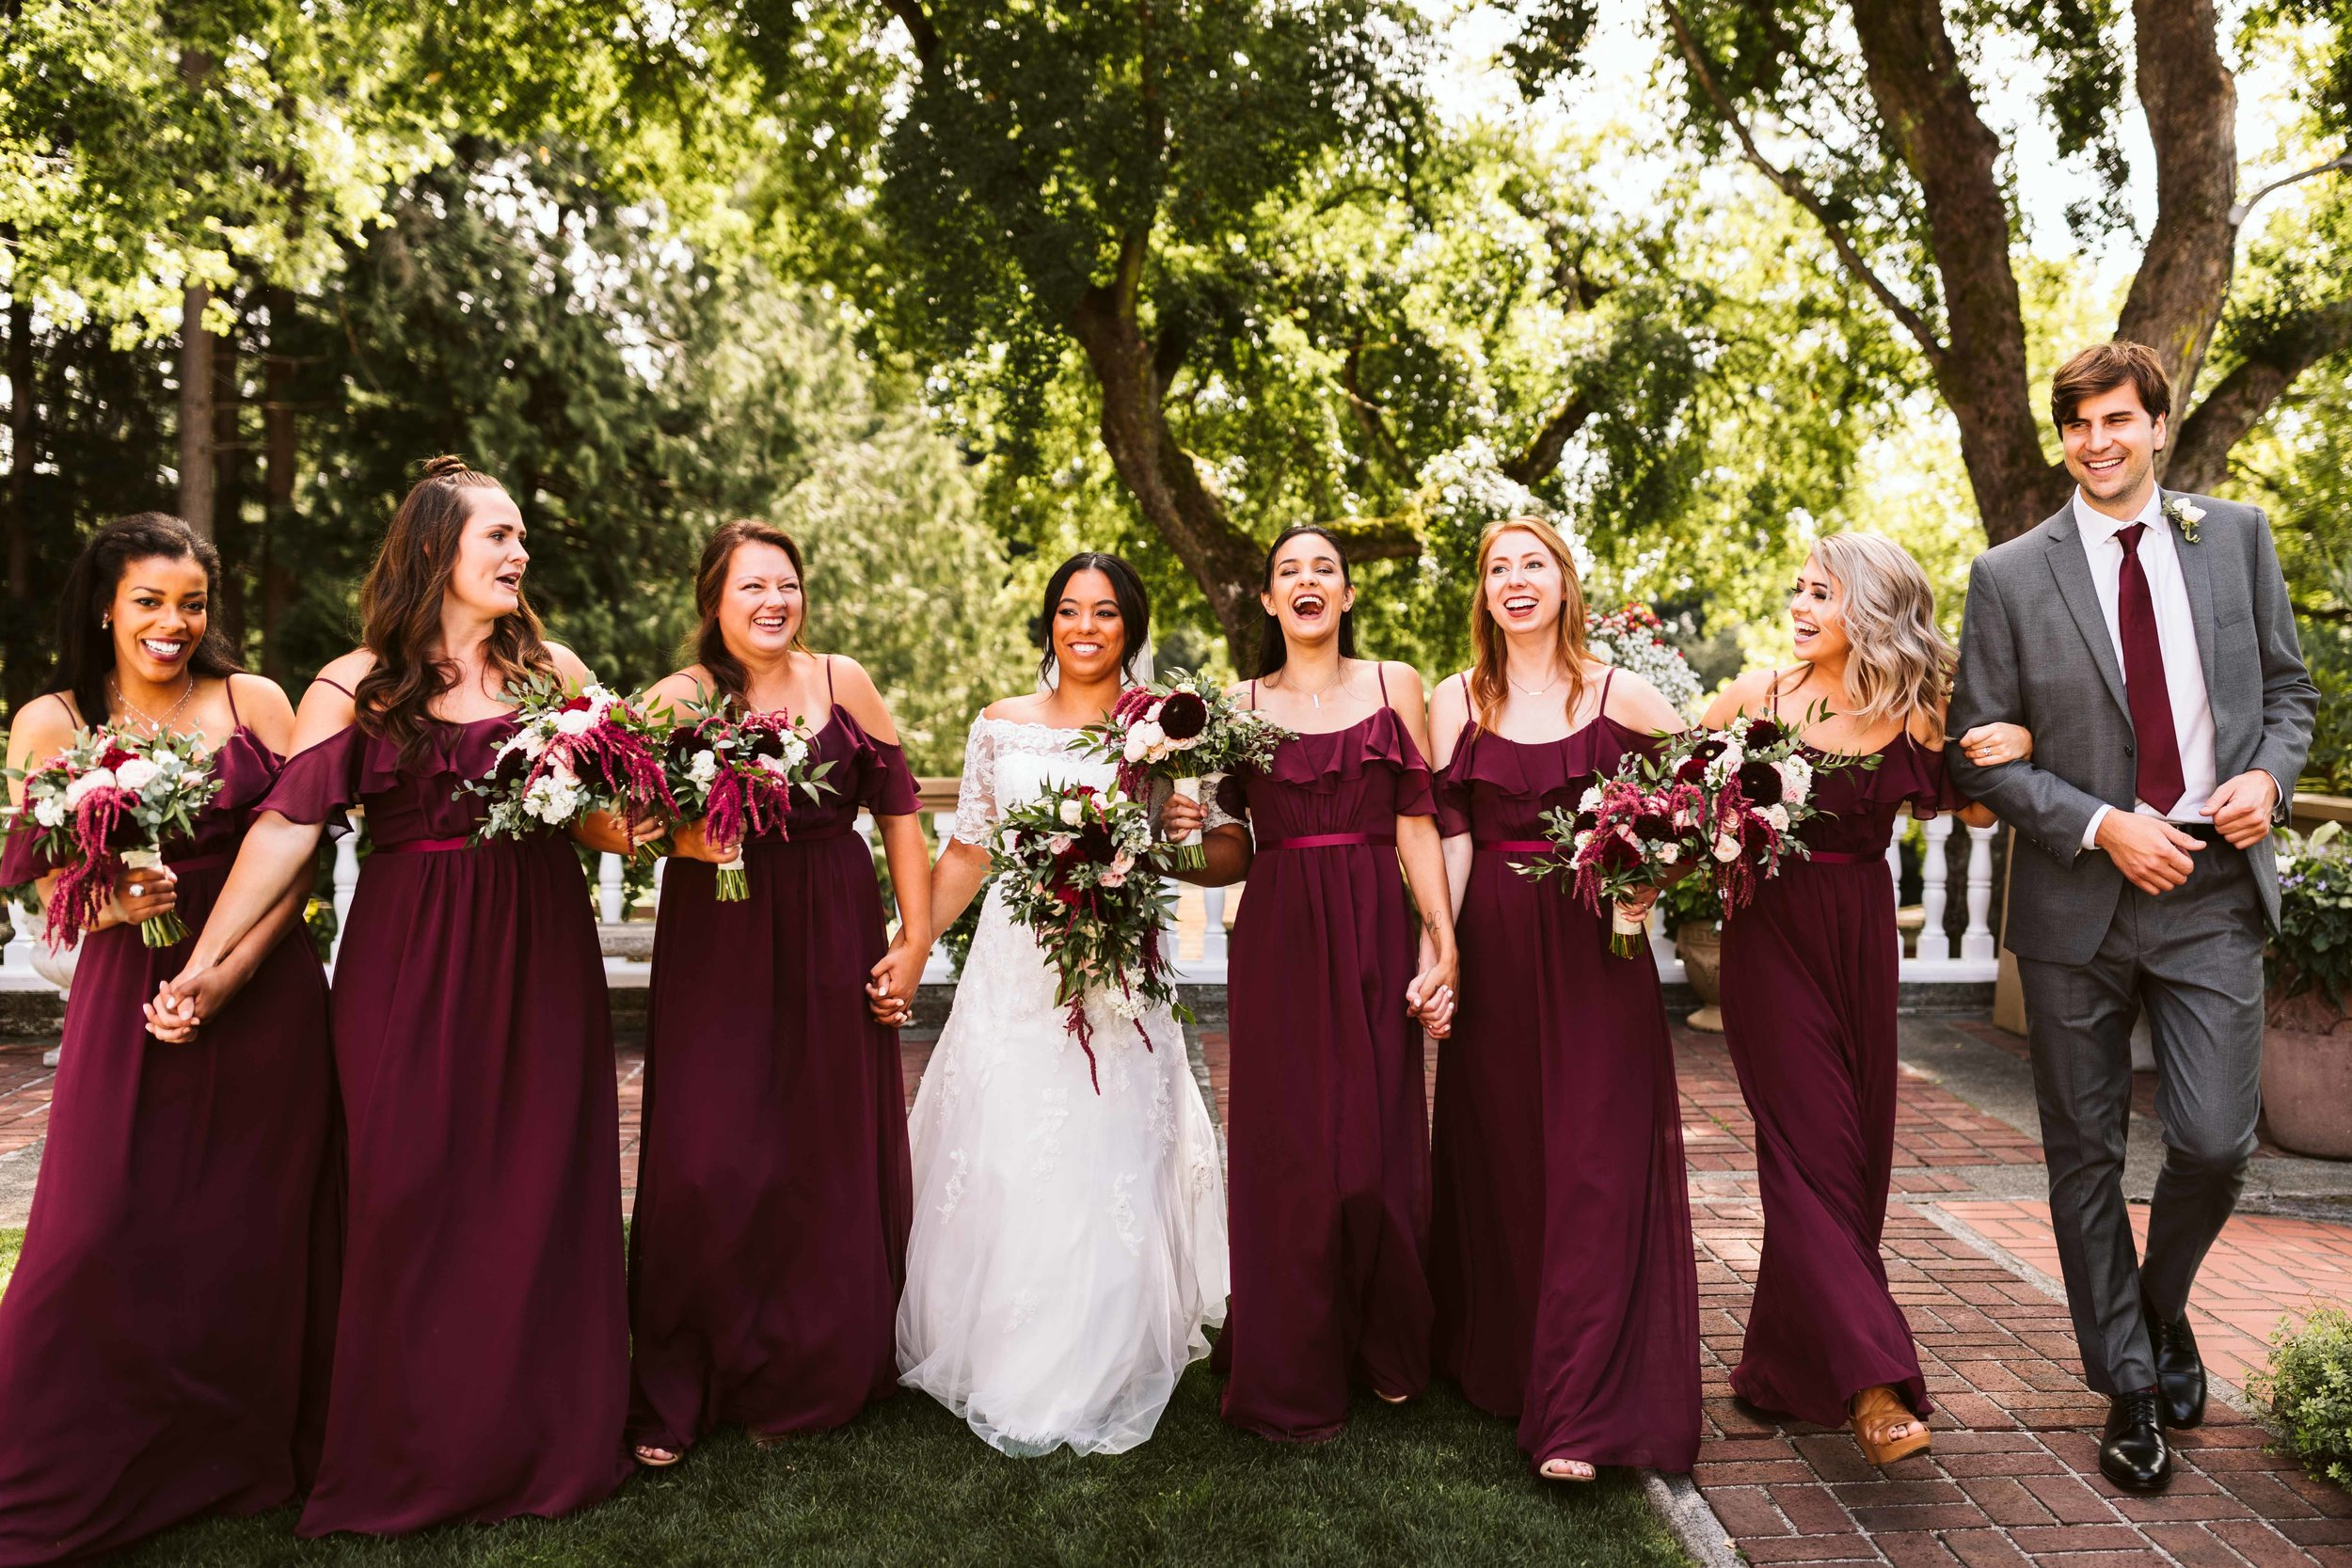 lairmont-manor-wedding-45.jpg